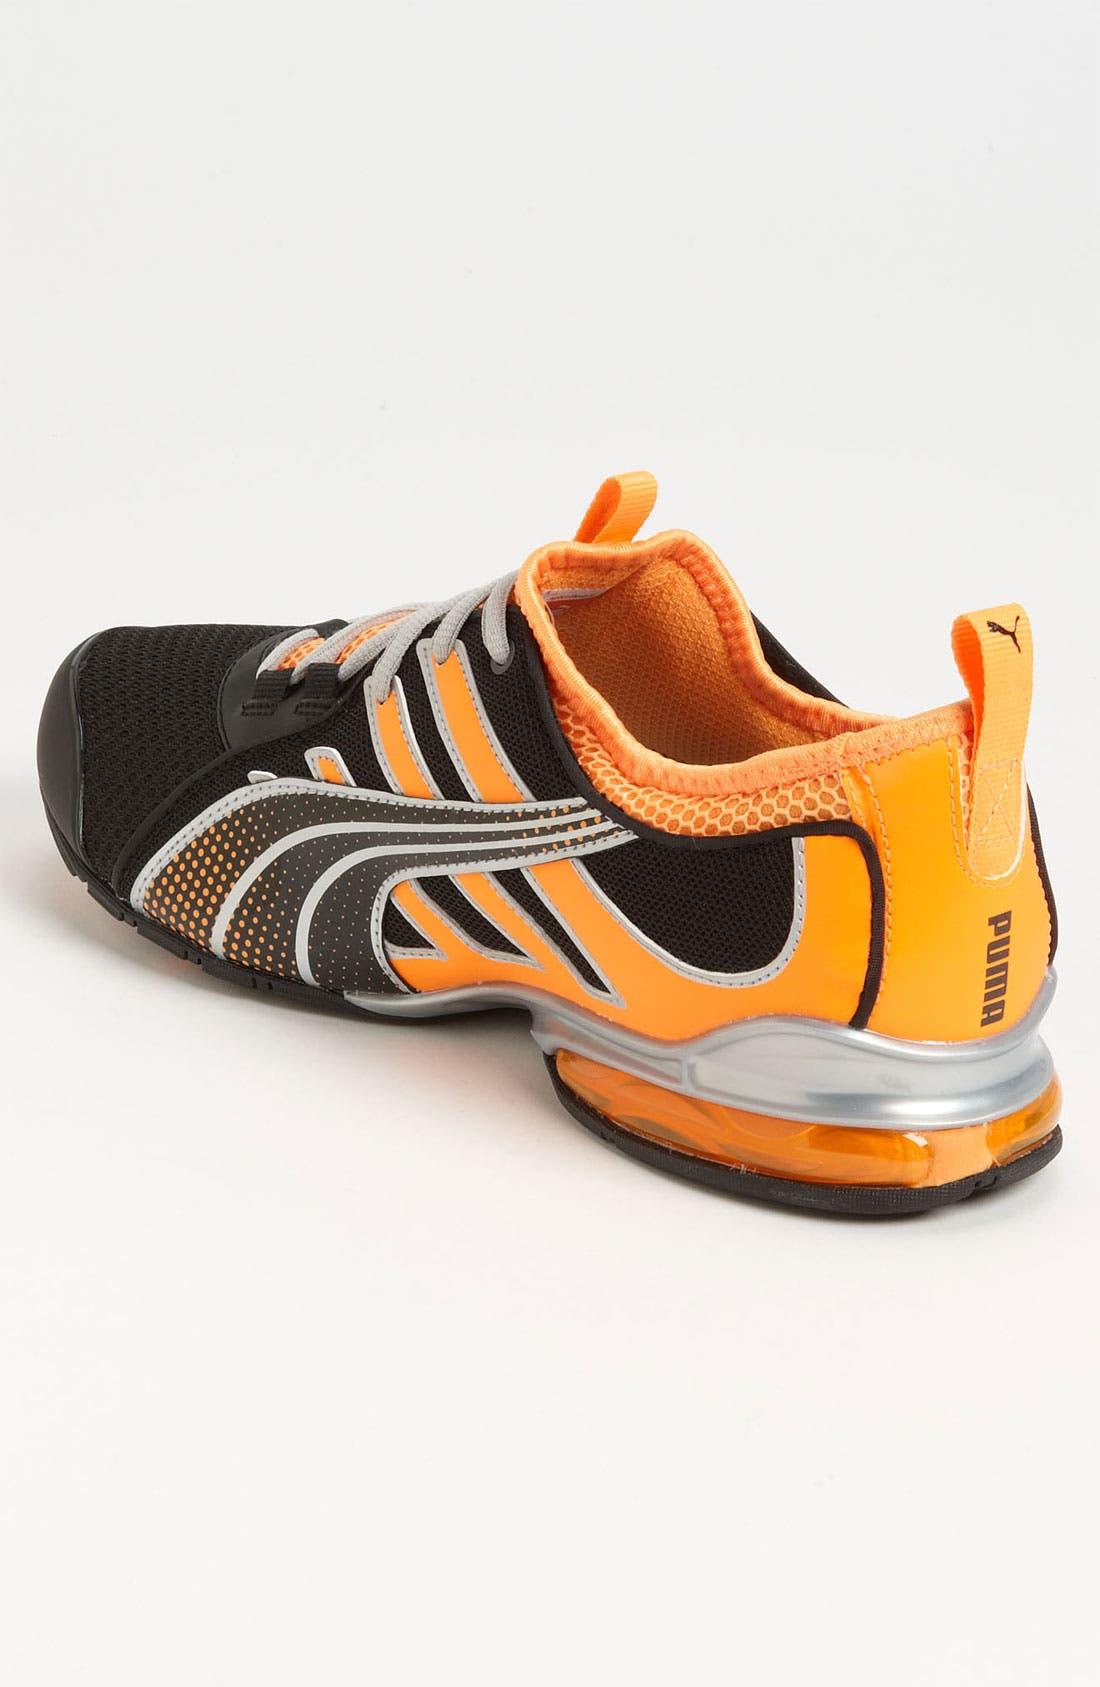 PUMA,                             'Voltaic 4 M' Training Shoe,                             Alternate thumbnail 4, color,                             001